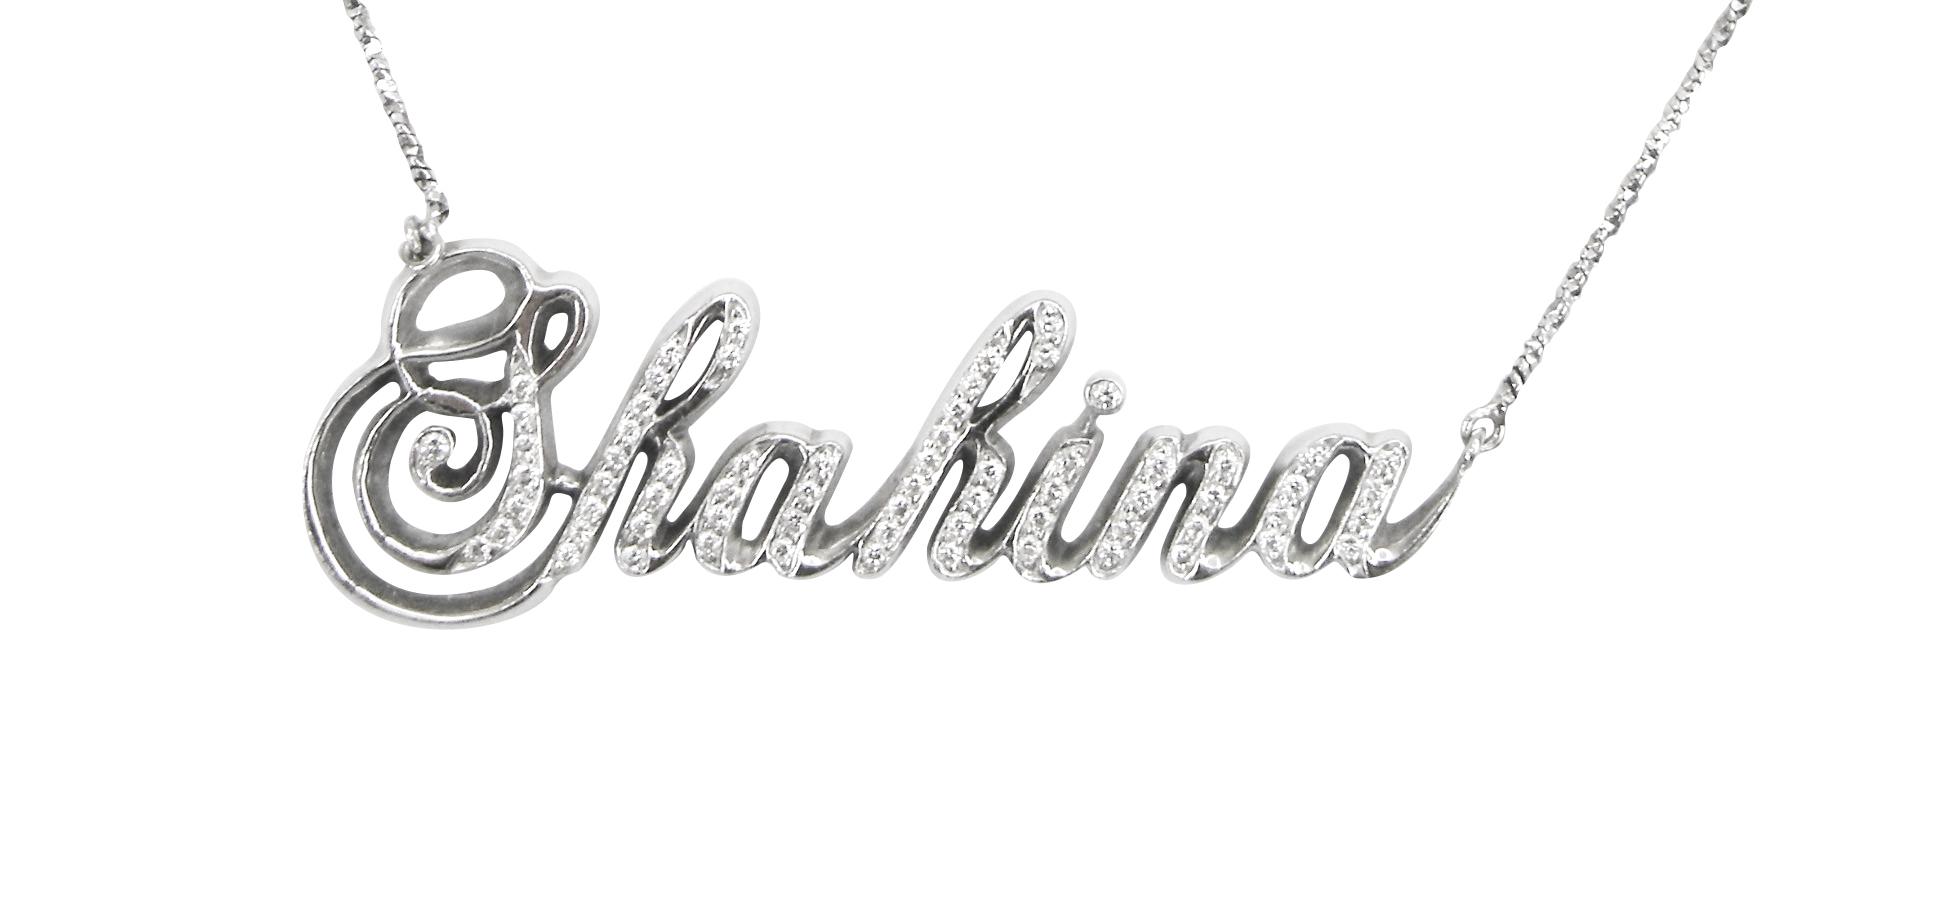 DIAMOND NAMEPLATE NECKLACE CLUSTER DIAMOND PENDANT BESPOKE FINE JEWELLERY BY SHAHINA HATTA